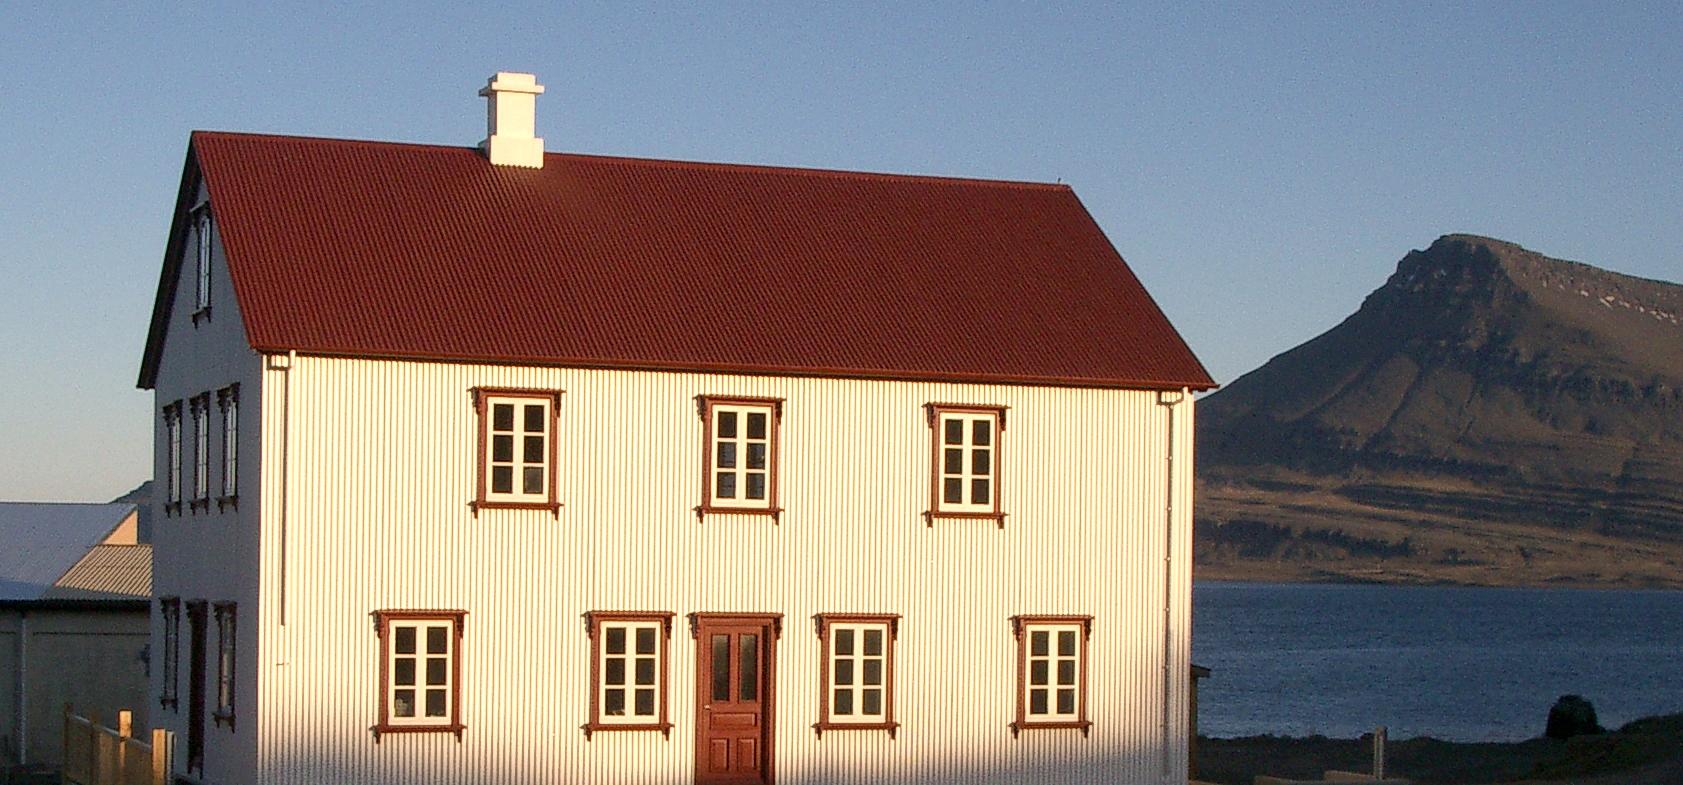 Breiðdalssetur Research and Heritage Centre